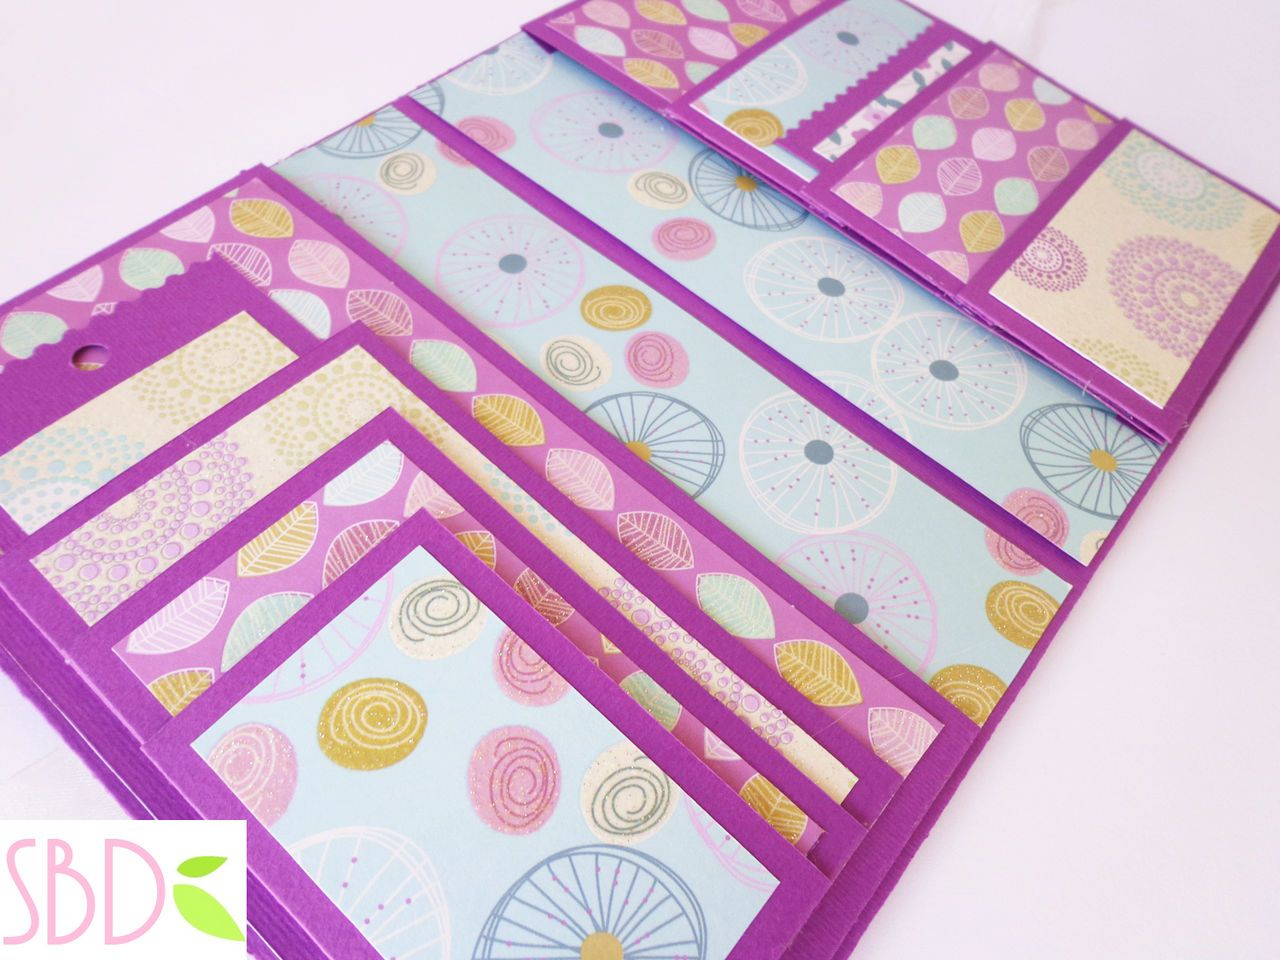 Smash book slim porta foto e ricordi diy by sweetbiodesign smash book slim porta foto e ricordi diy by sweetbiodesignspot solutioingenieria Gallery